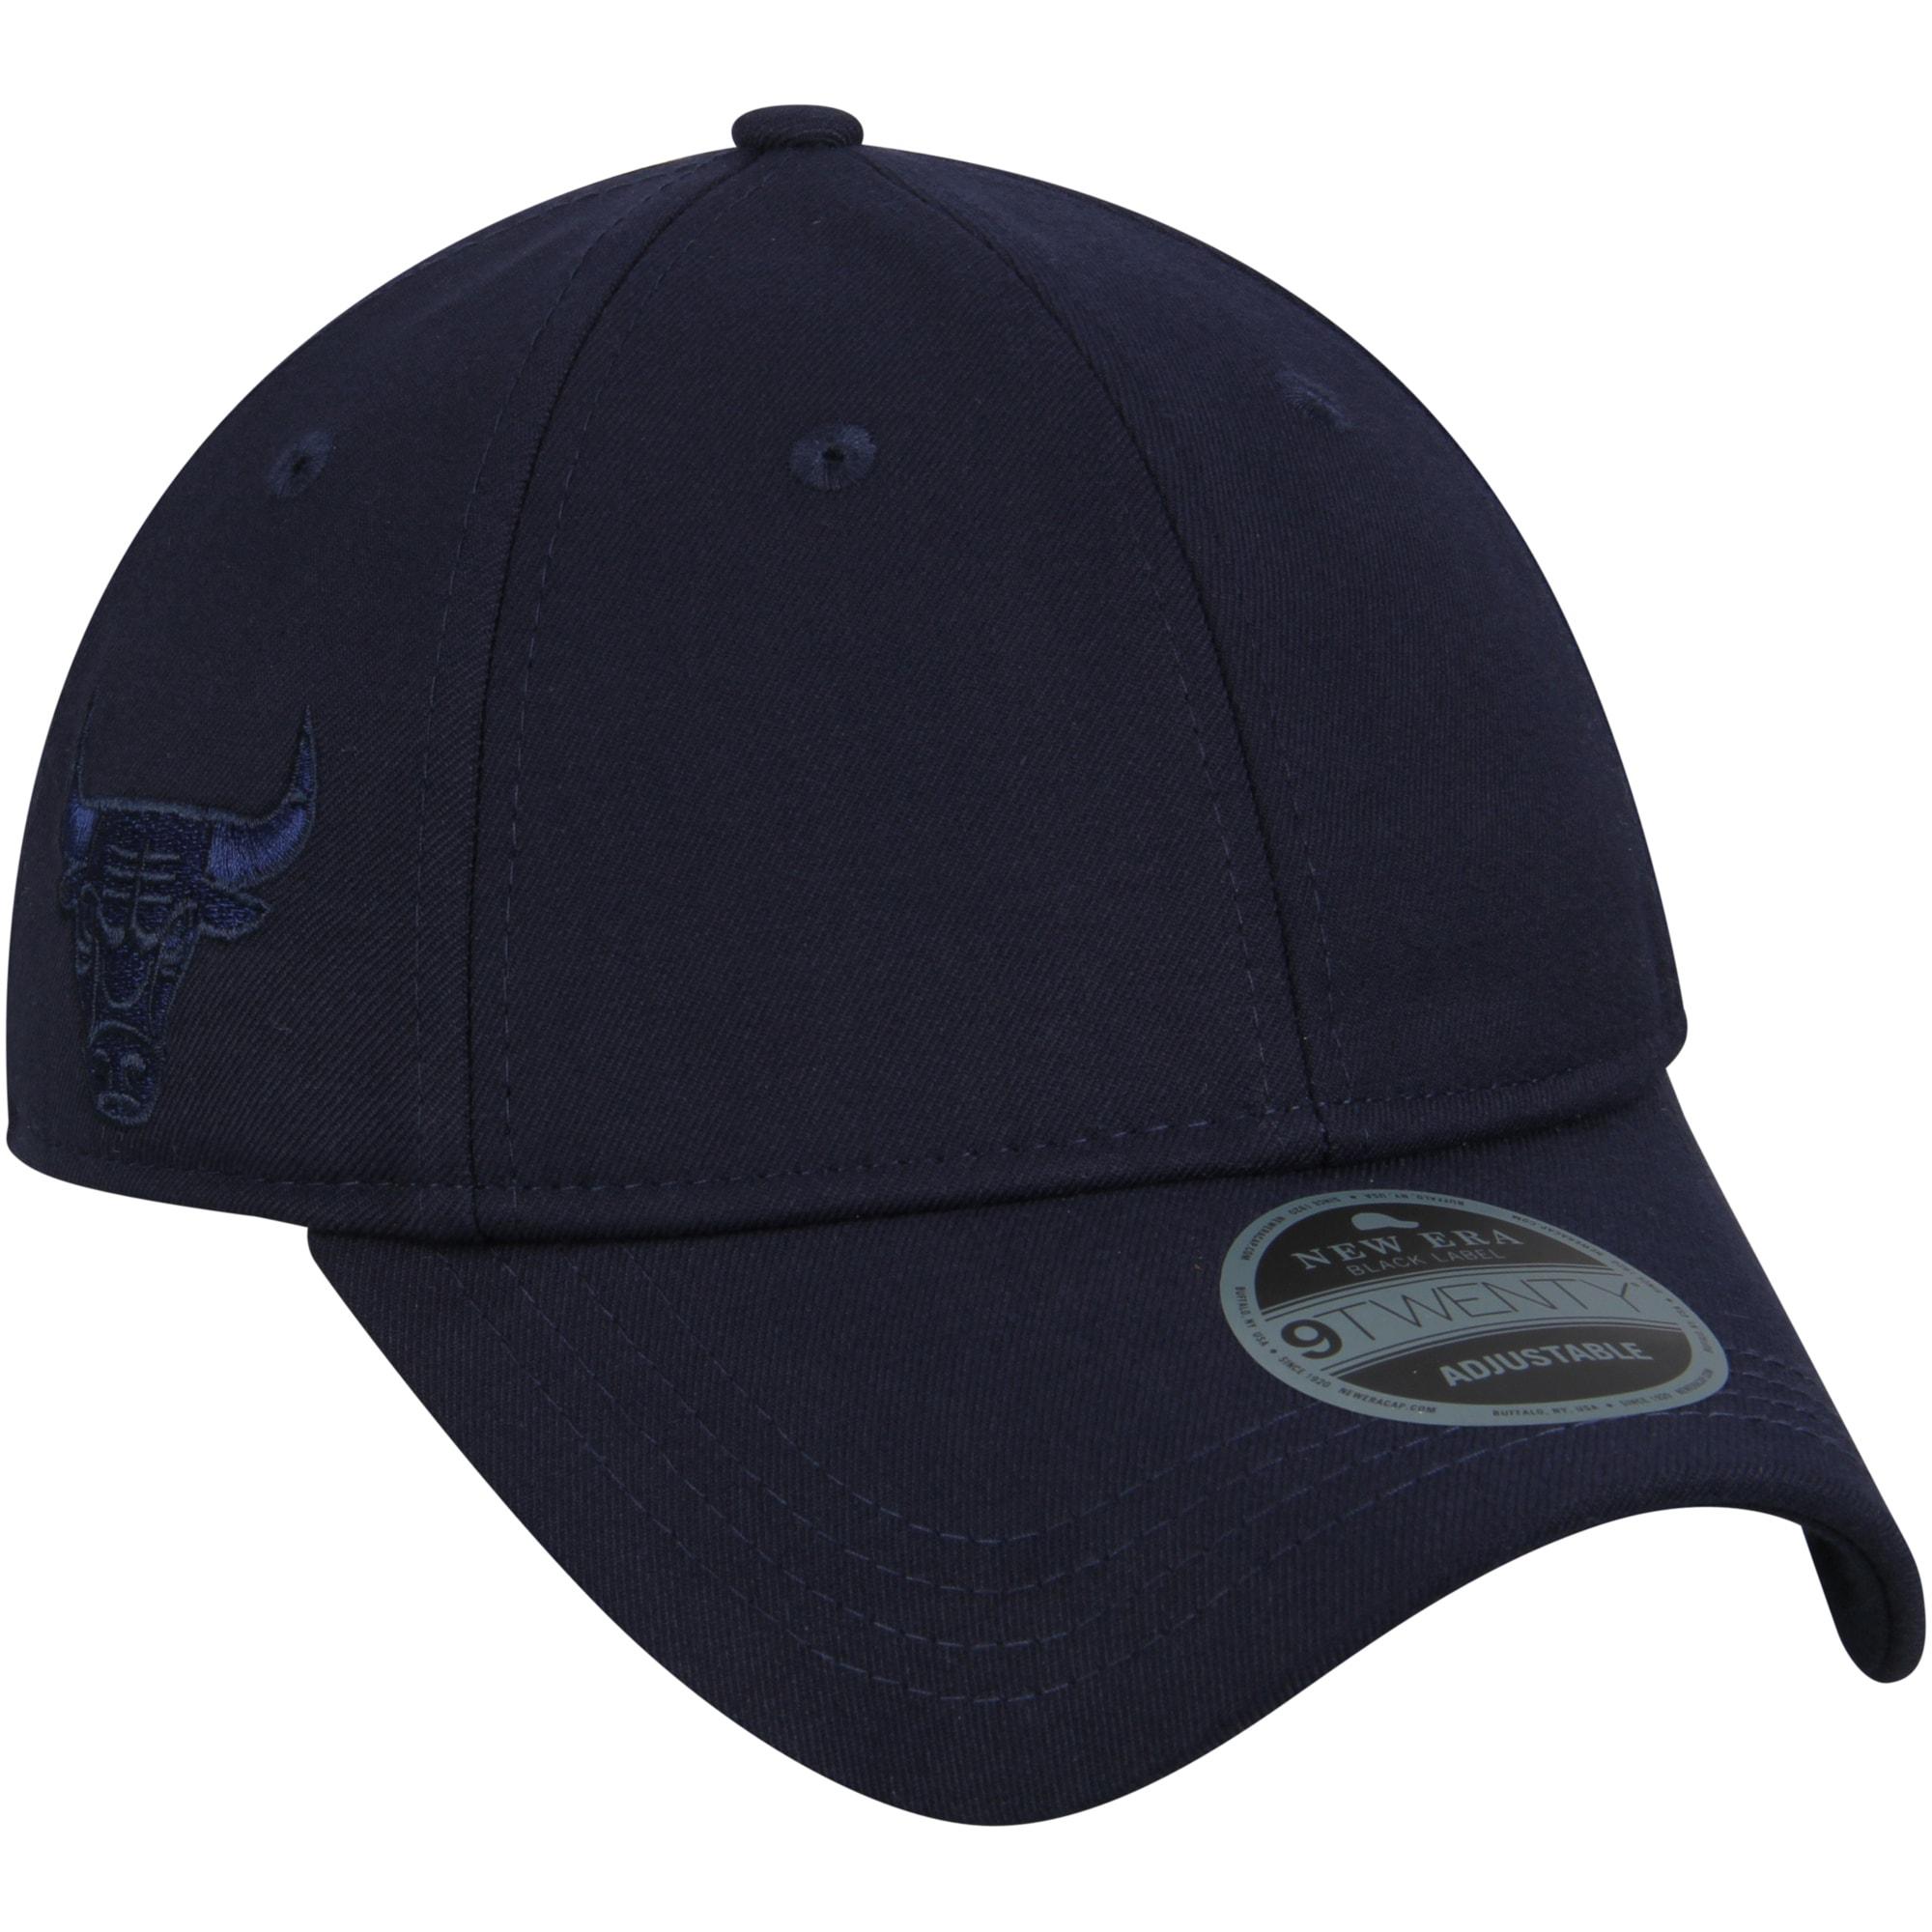 Chicago Bulls New Era Black Label Series Suiting 9TWENTY Adjustable Hat - Navy